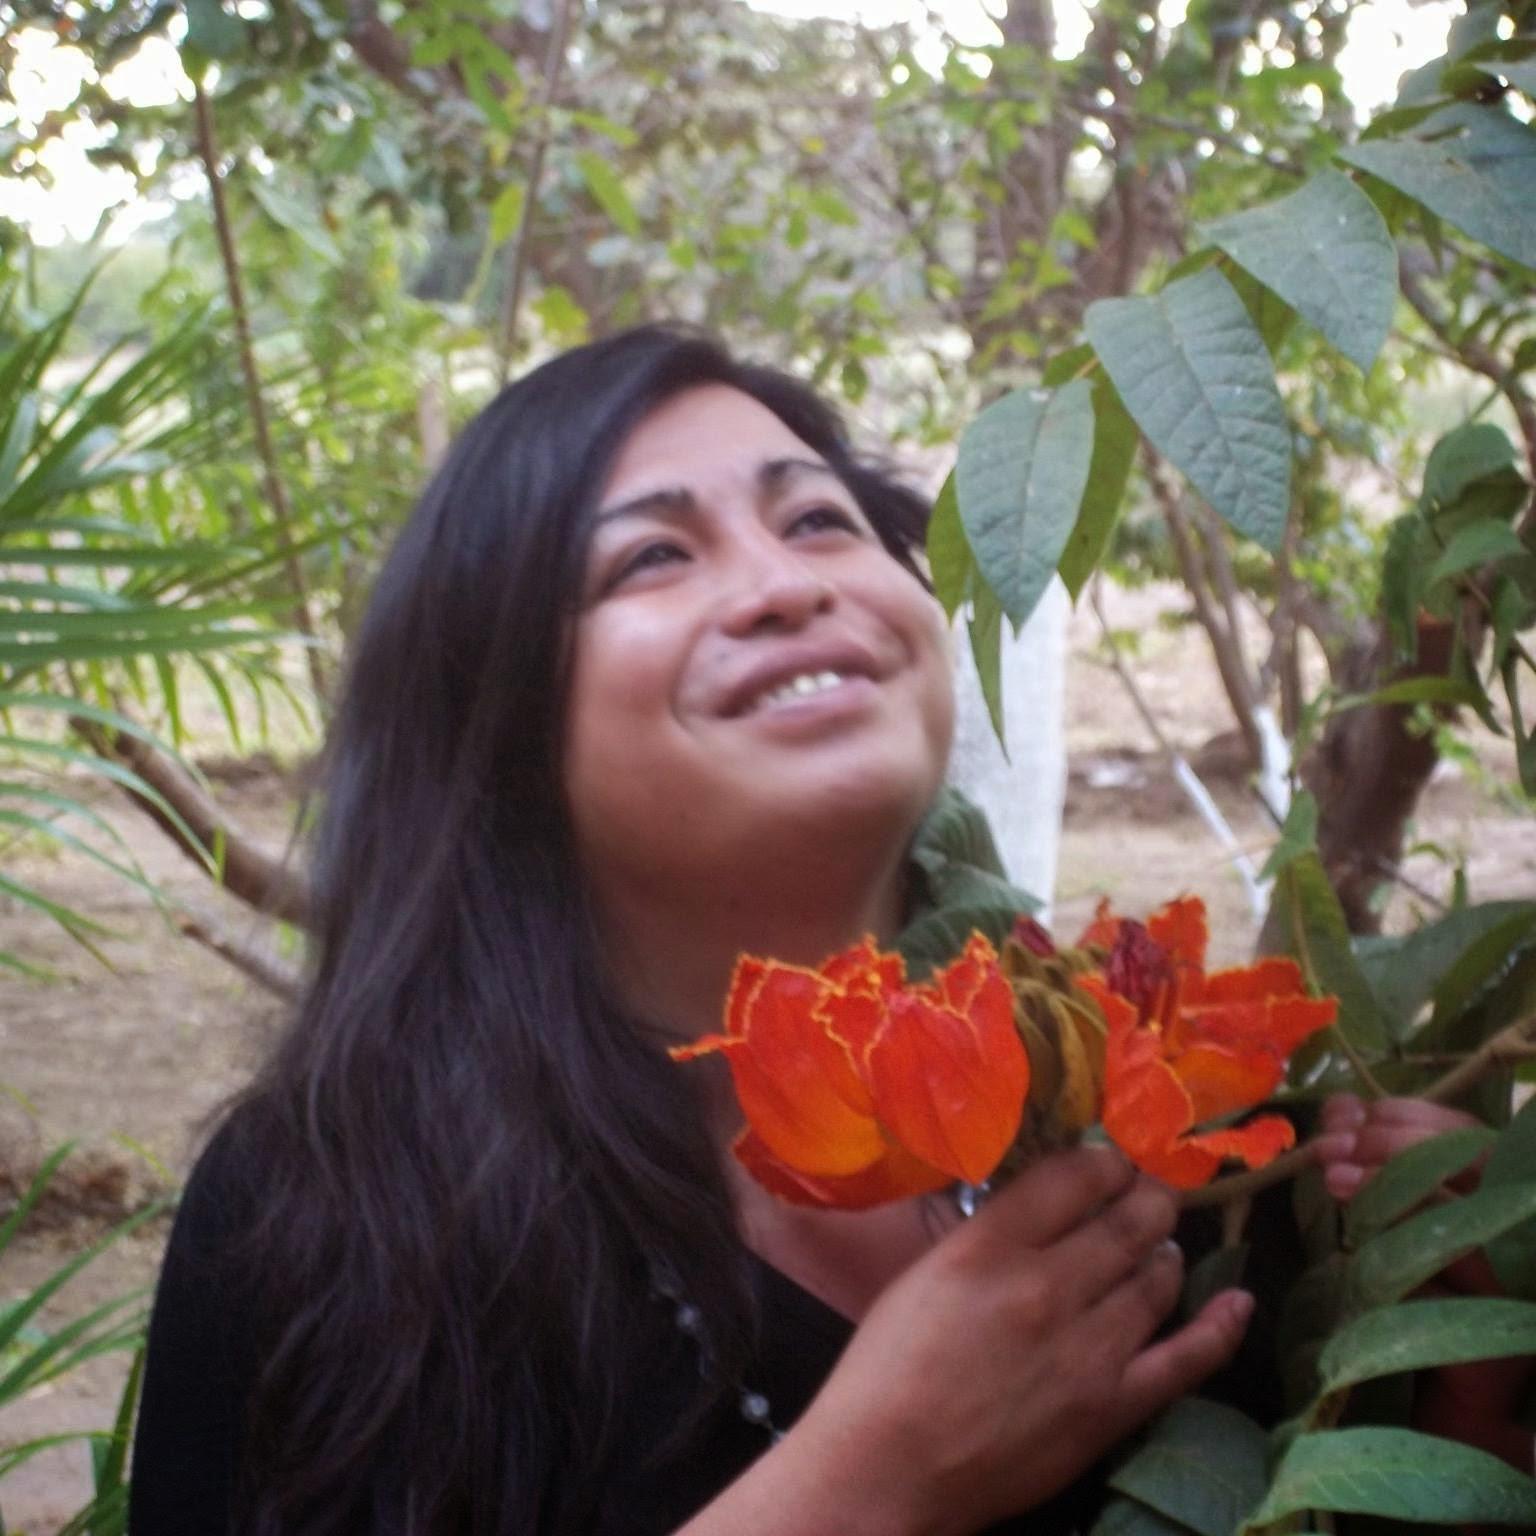 http://www.mediafire.com/listen/n1lp661z19yjyzl/2014-12-21_El_Vahido.mp3